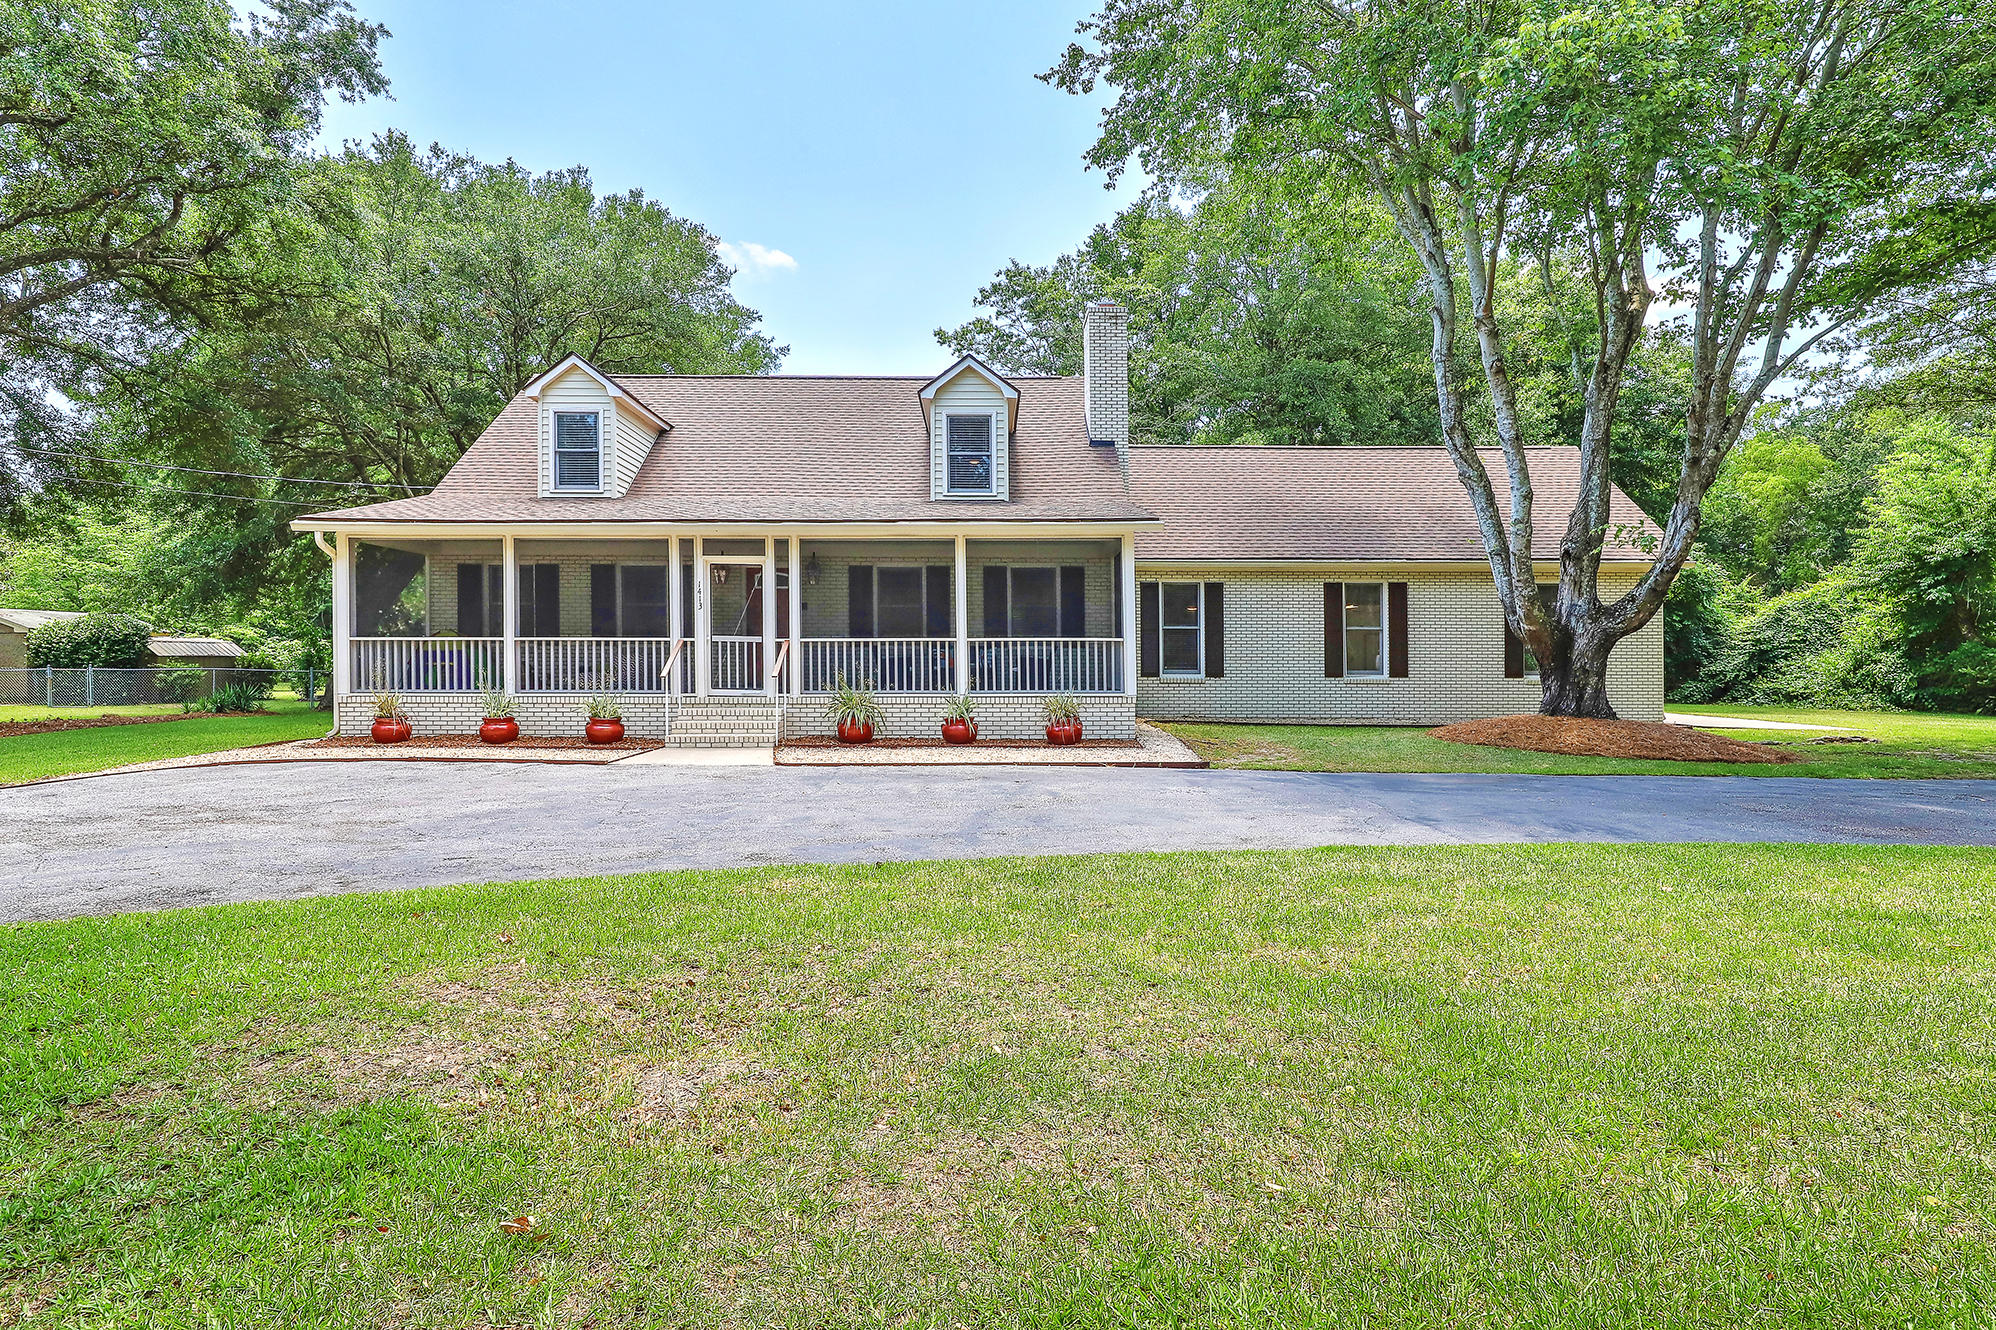 Edgewater Park Homes For Sale - 1413 Edsent, Charleston, SC - 11